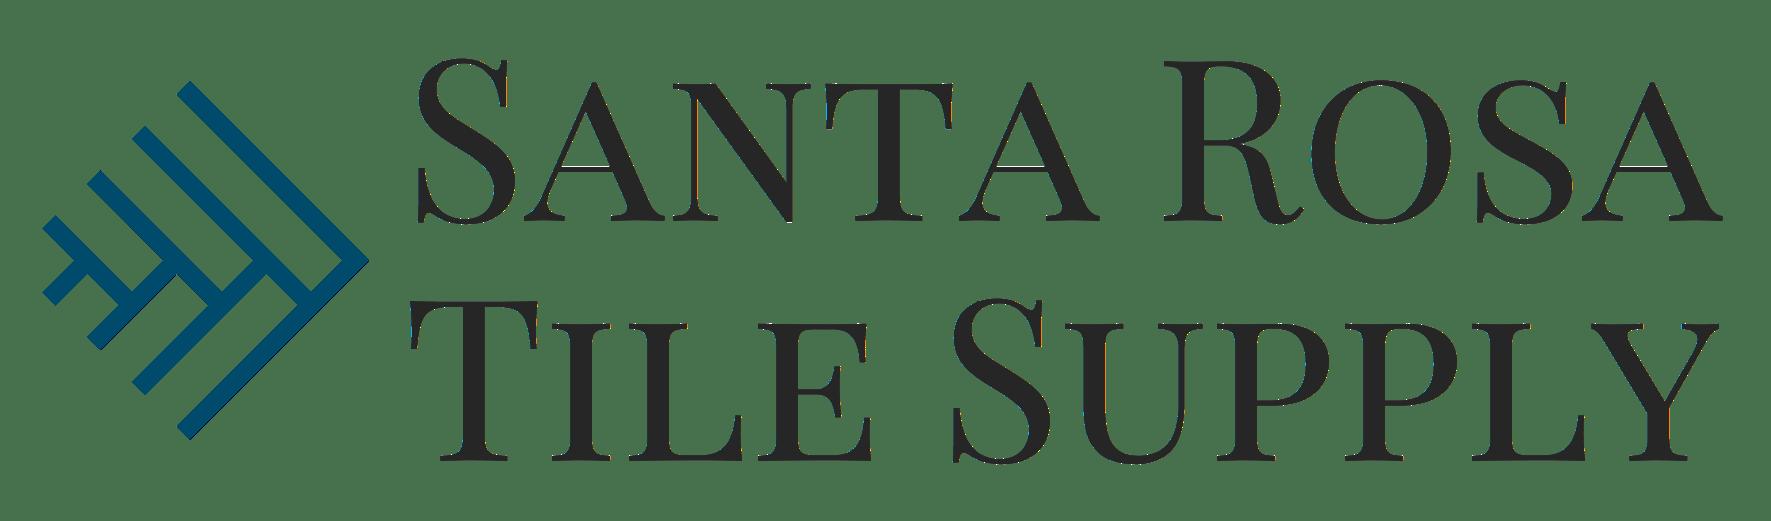 www santarosatile com